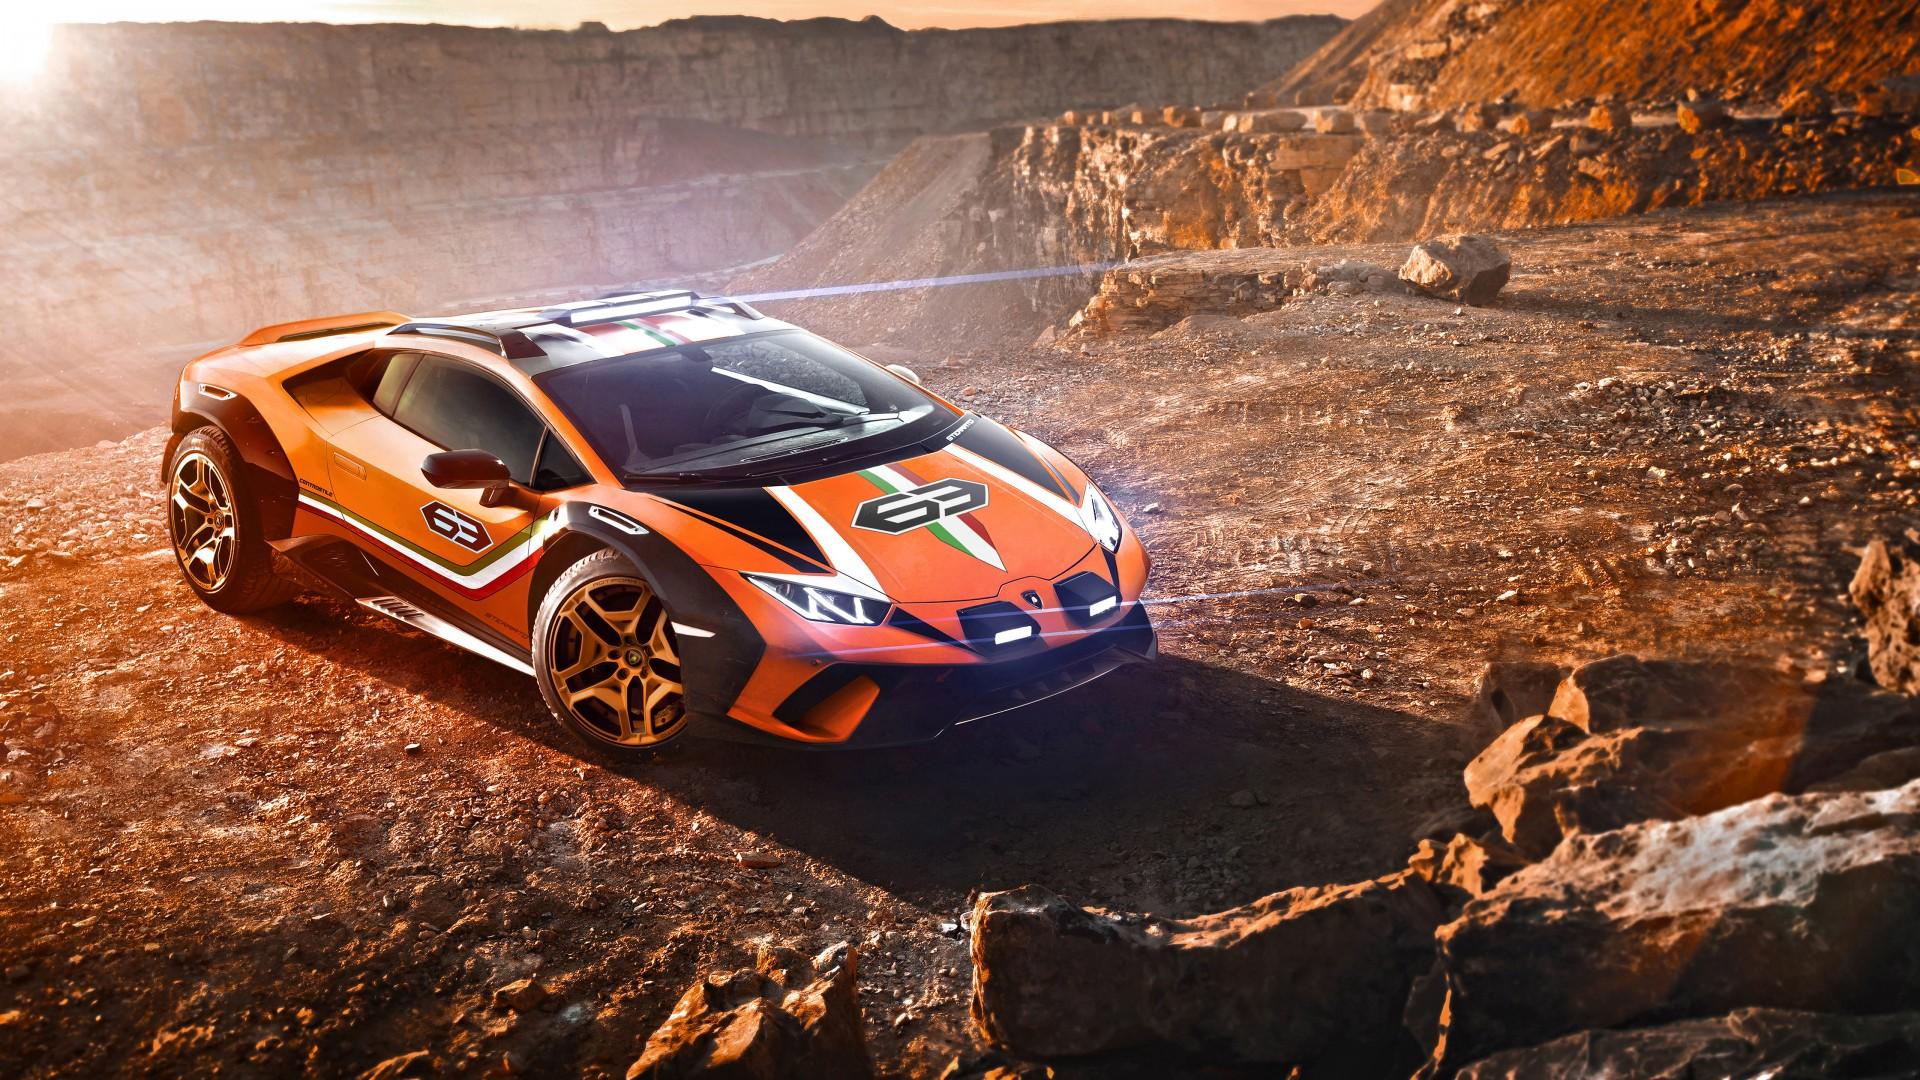 Car Wallpapers Lamborghini Gallardo Lamborghini Huracan Sterrato Concept 2019 5k 2 Wallpaper